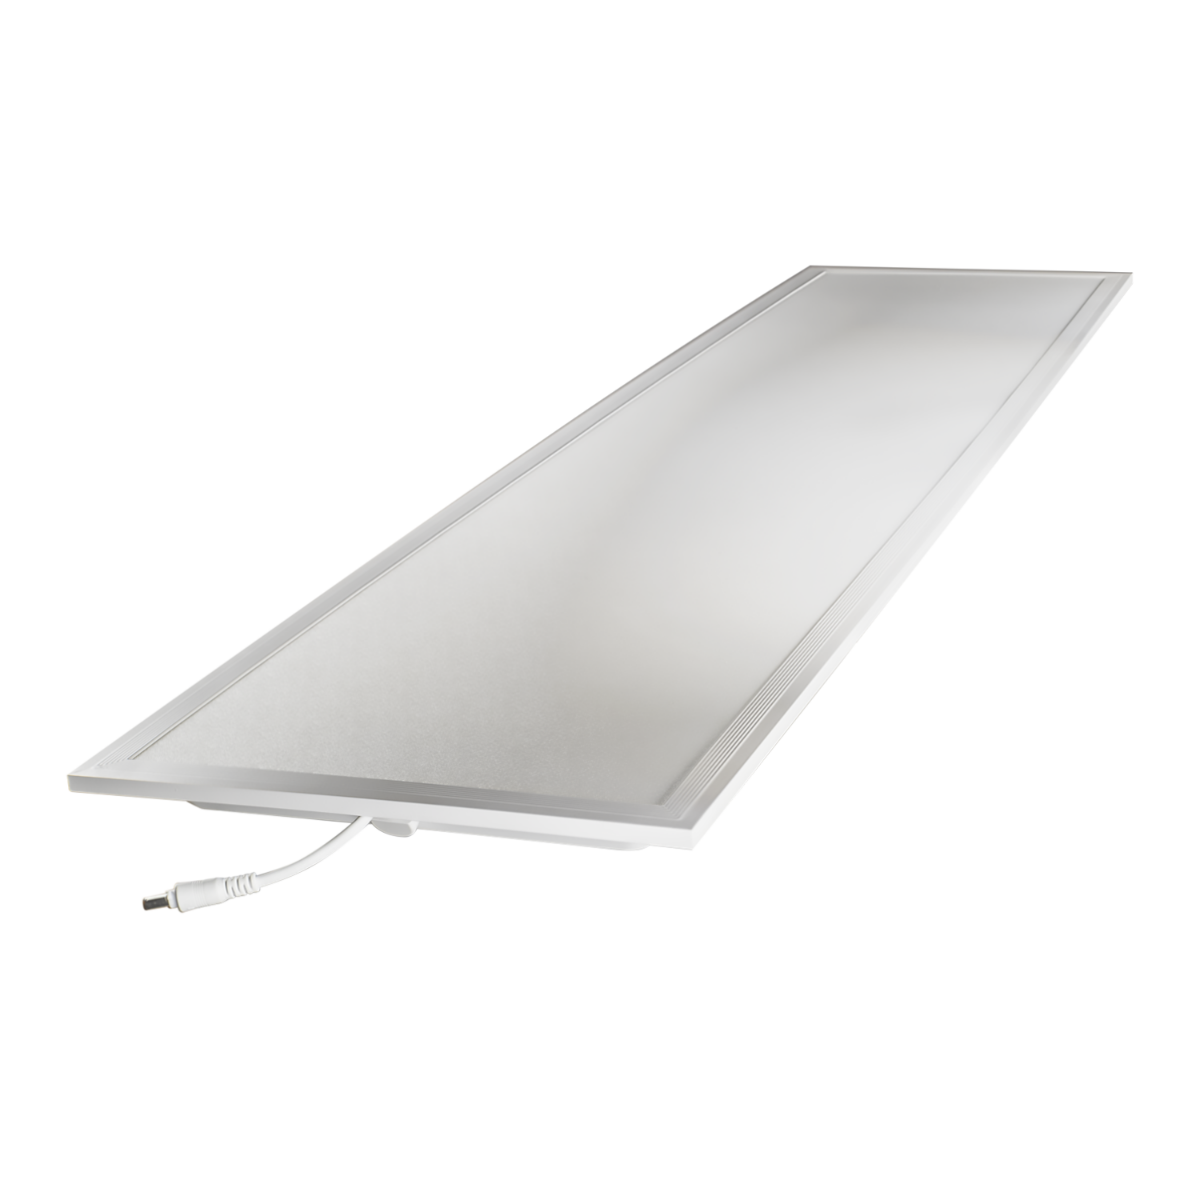 Noxion LED Panel Delta Pro V2.0 Xitanium DALI 30W 30x120cm 3000K 3960lm UGR <19 | Dali Dimmbar - Warmweiß - Ersatz für 2x36W